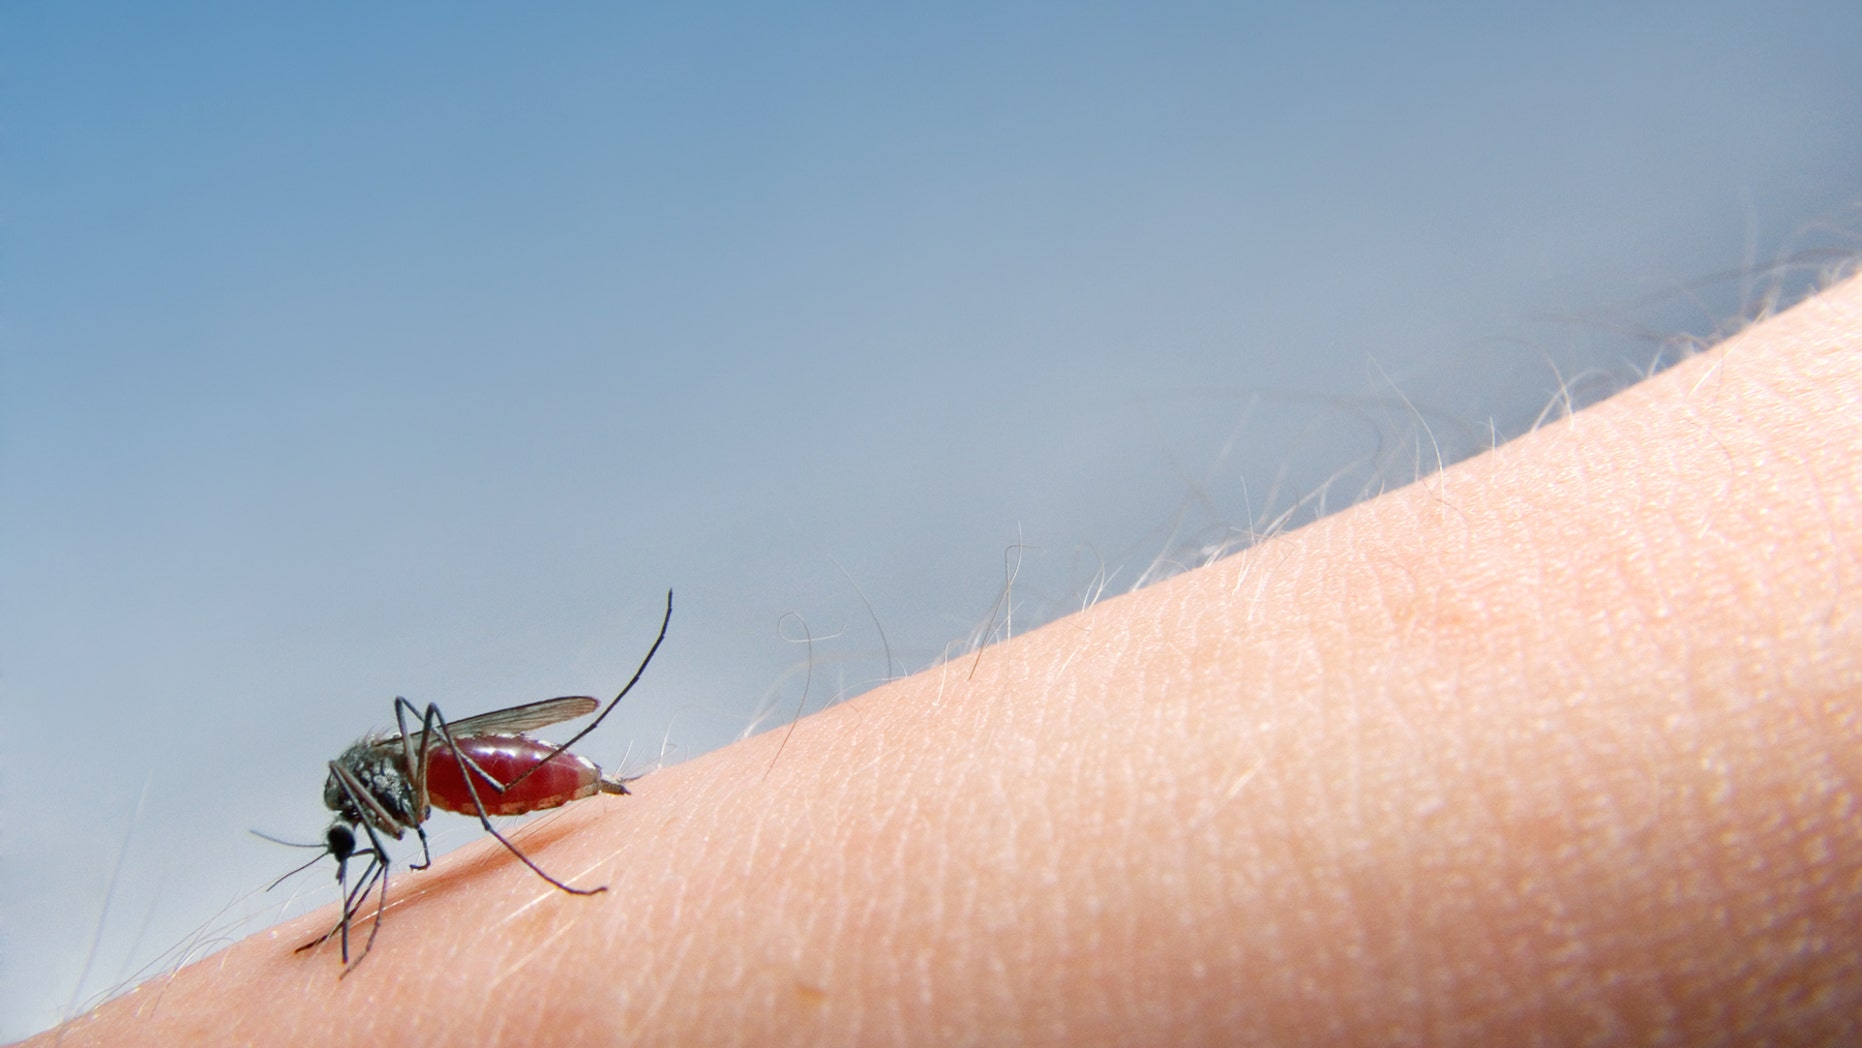 mosquito sucking blood.